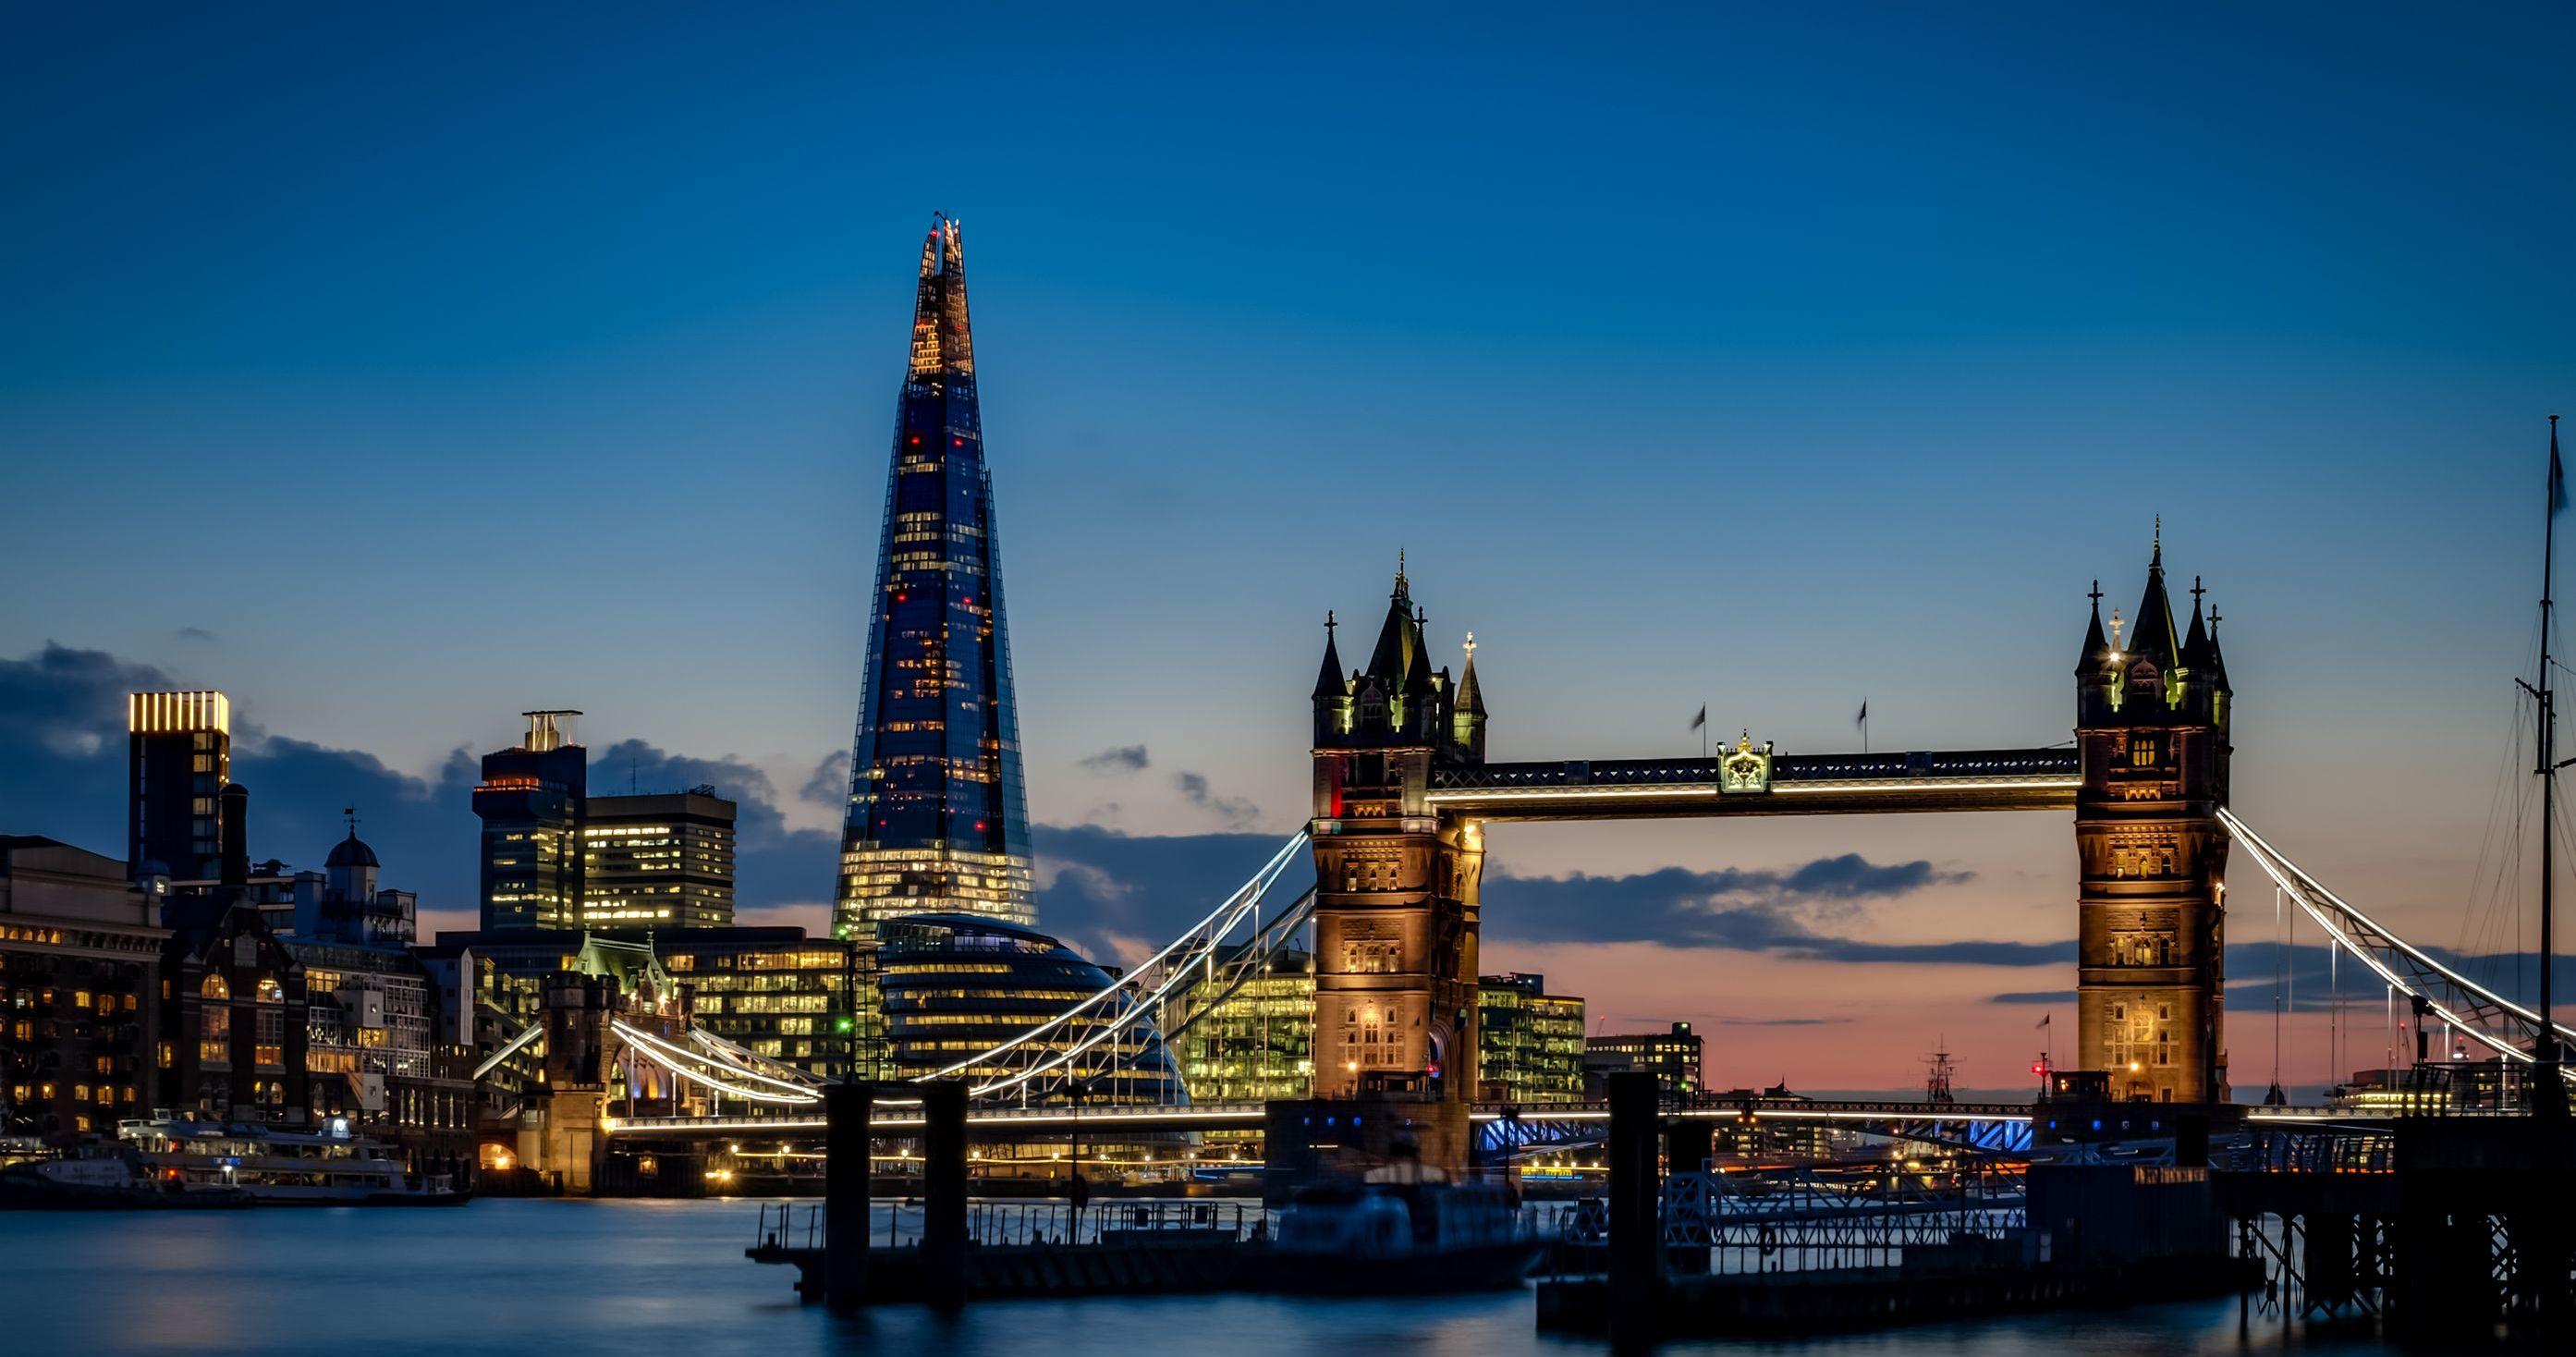 rsz_tower_bridge__london___night